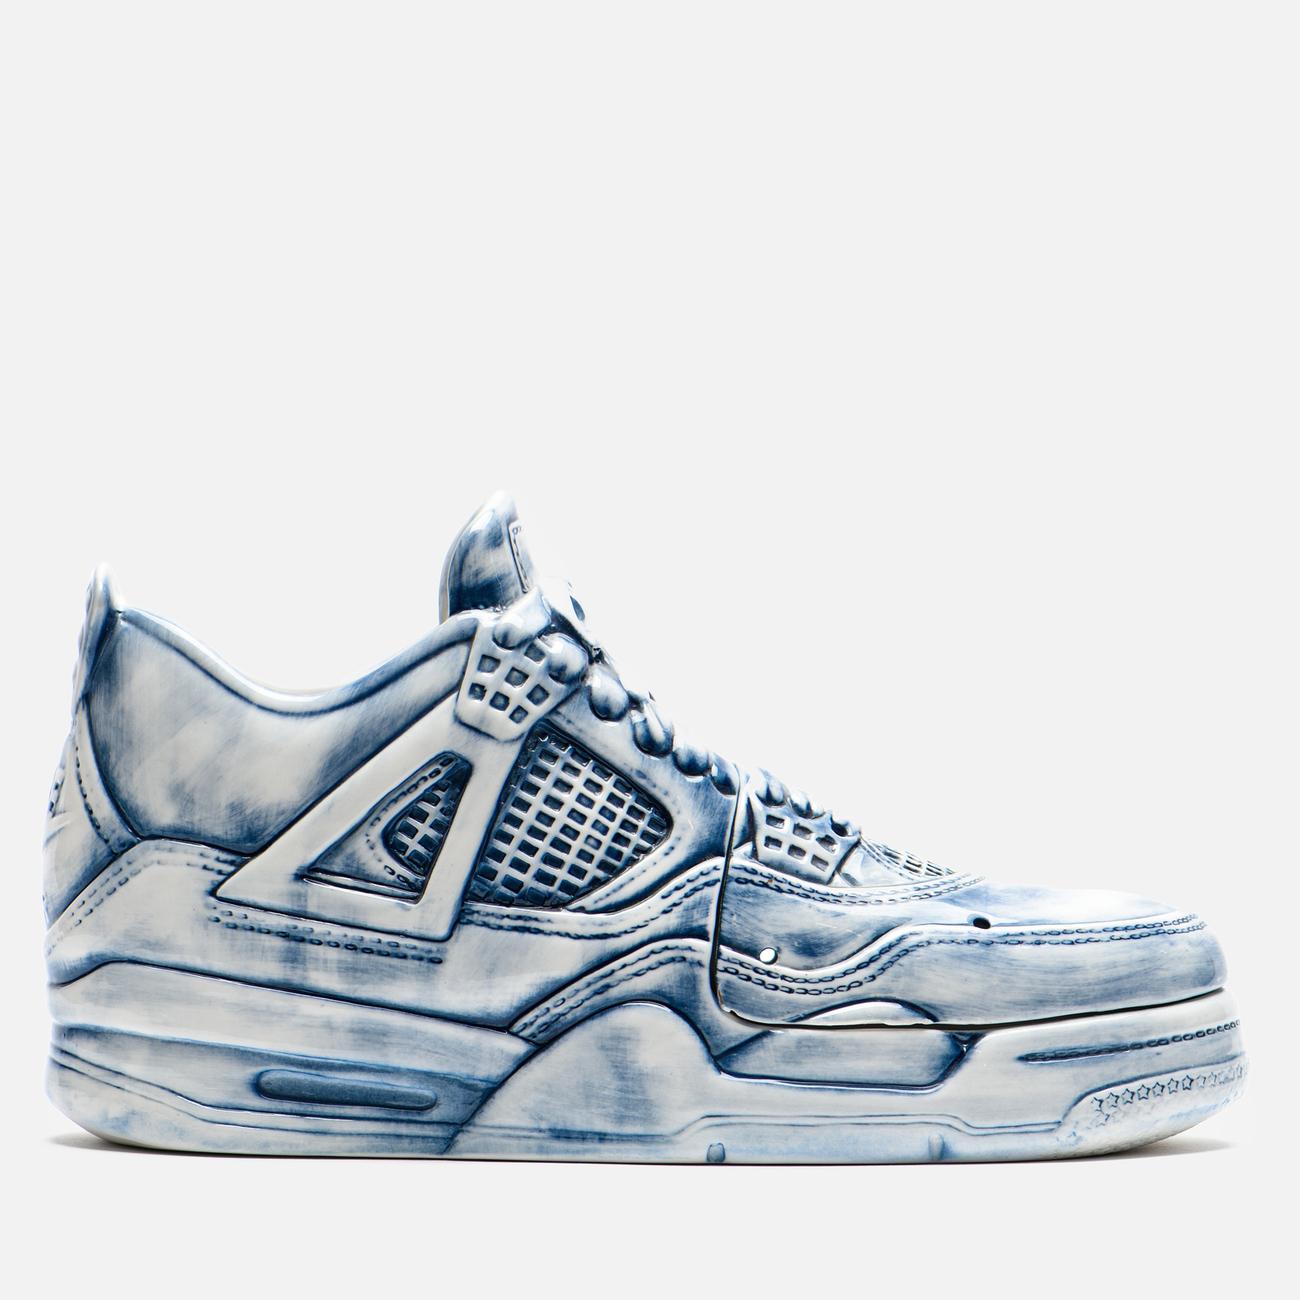 Фигурка Yeenjoy Studio Air Jordan 4 White/Blue